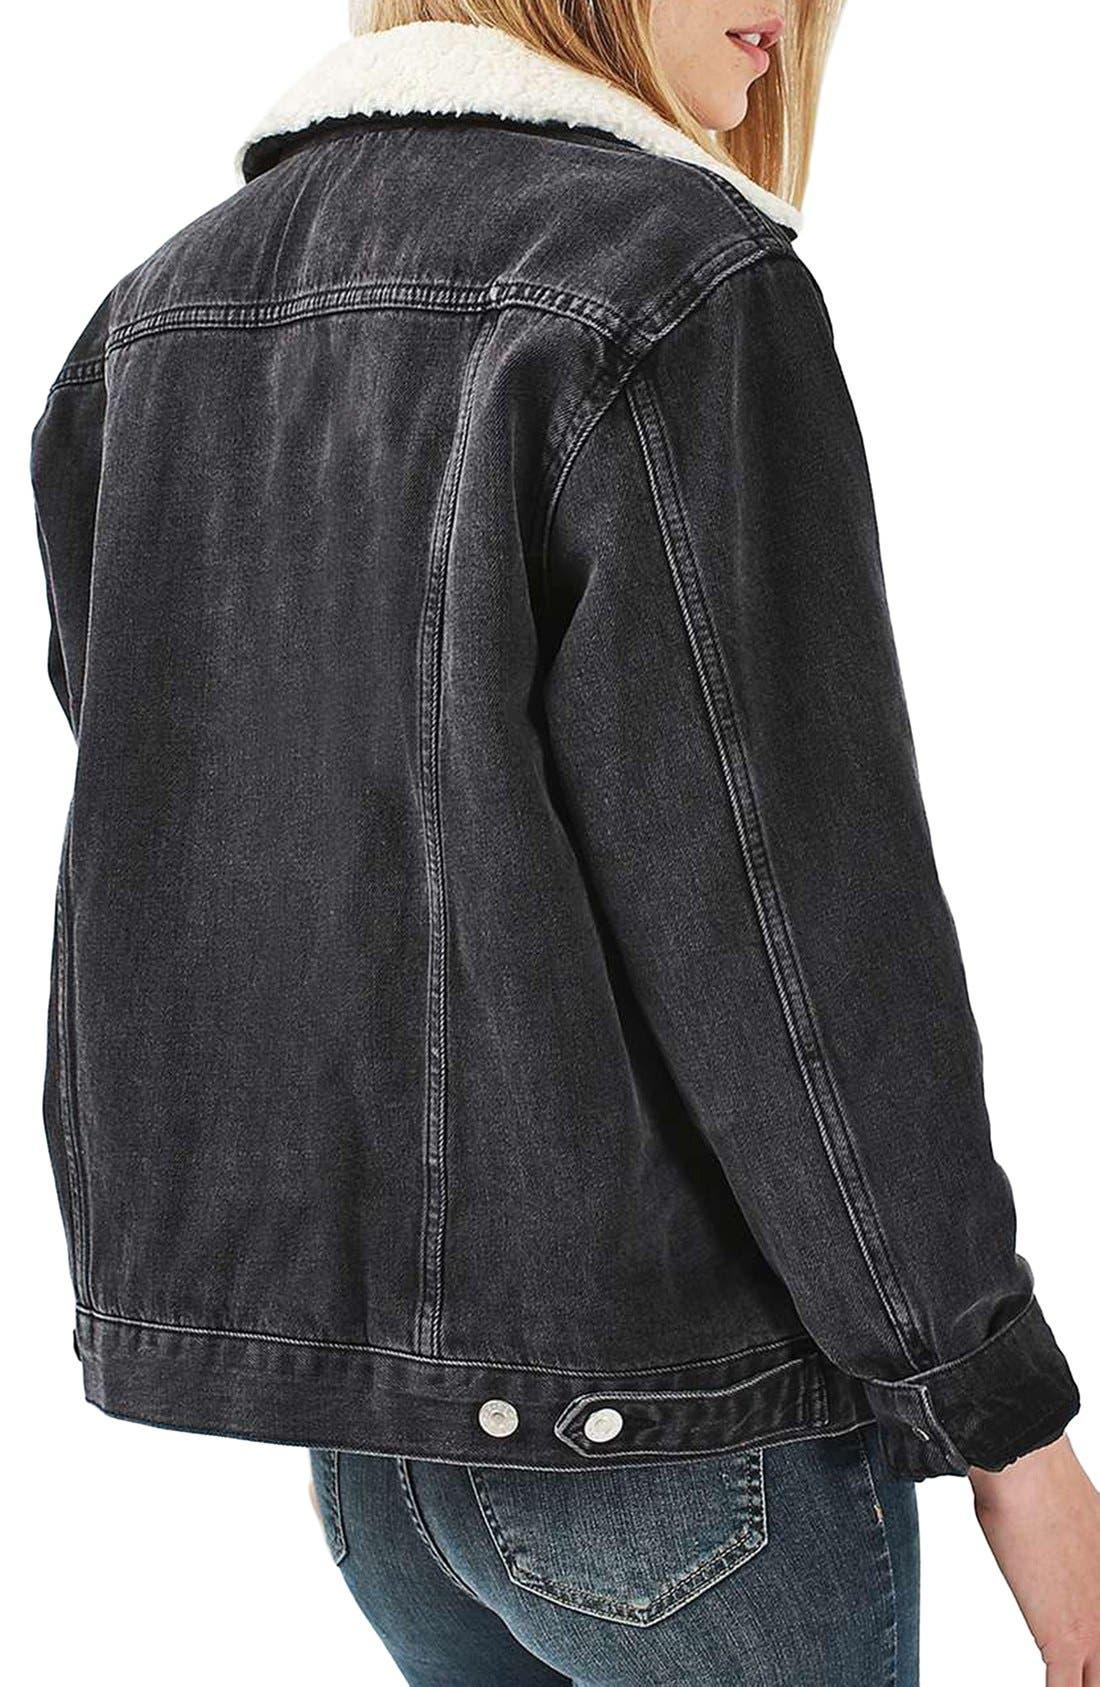 Alternate Image 3  - Topshop Moto Borg Lined Denim Jacket